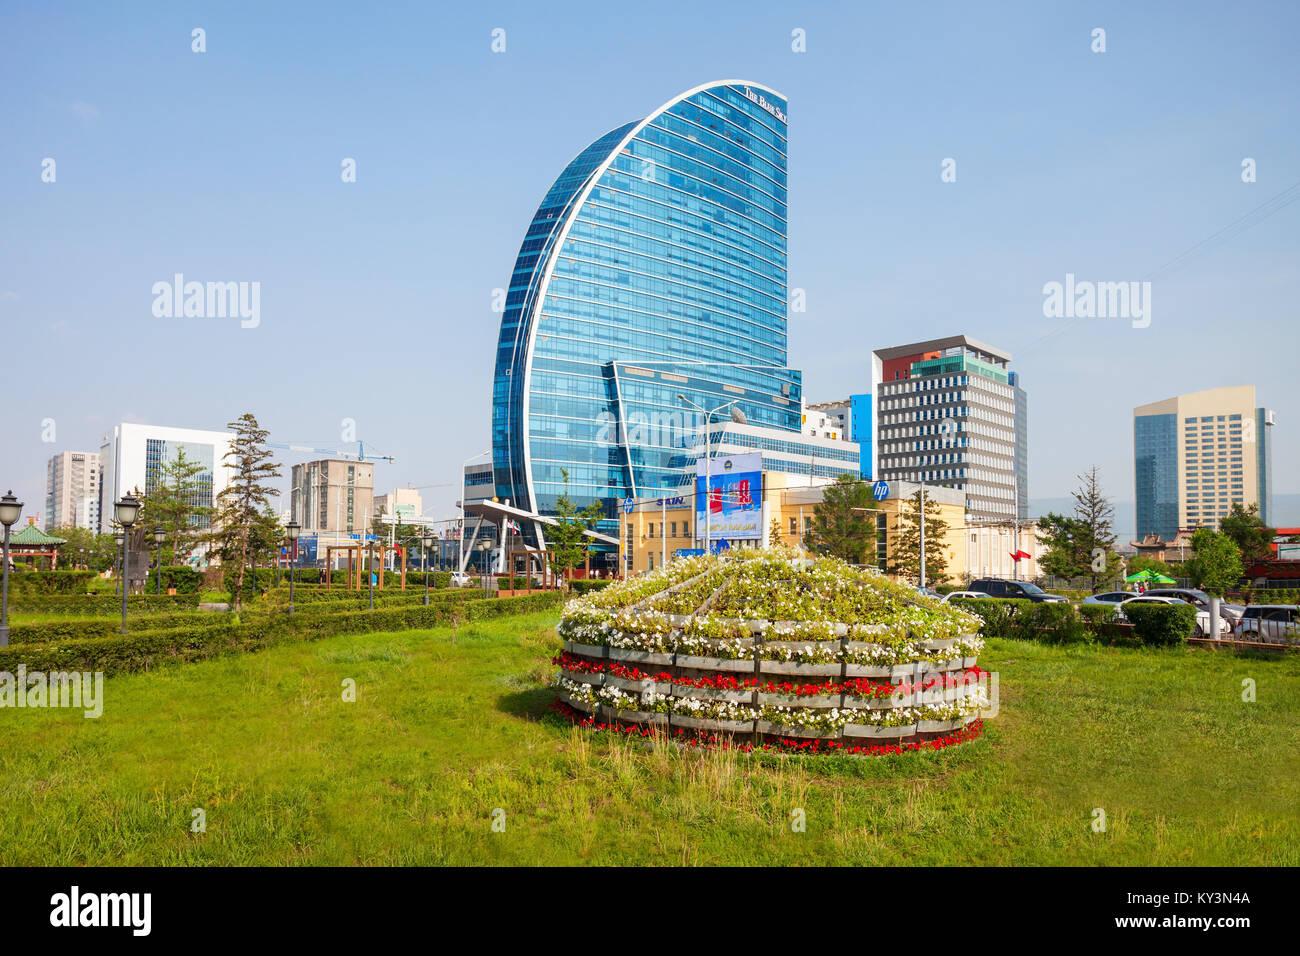 ULAANBAATAR, MONGOLIA - JULY 12, 2016: The Blue Sky Tower is located in Ulaanbaatar, Mongolia. The skyscraper is Stock Photo